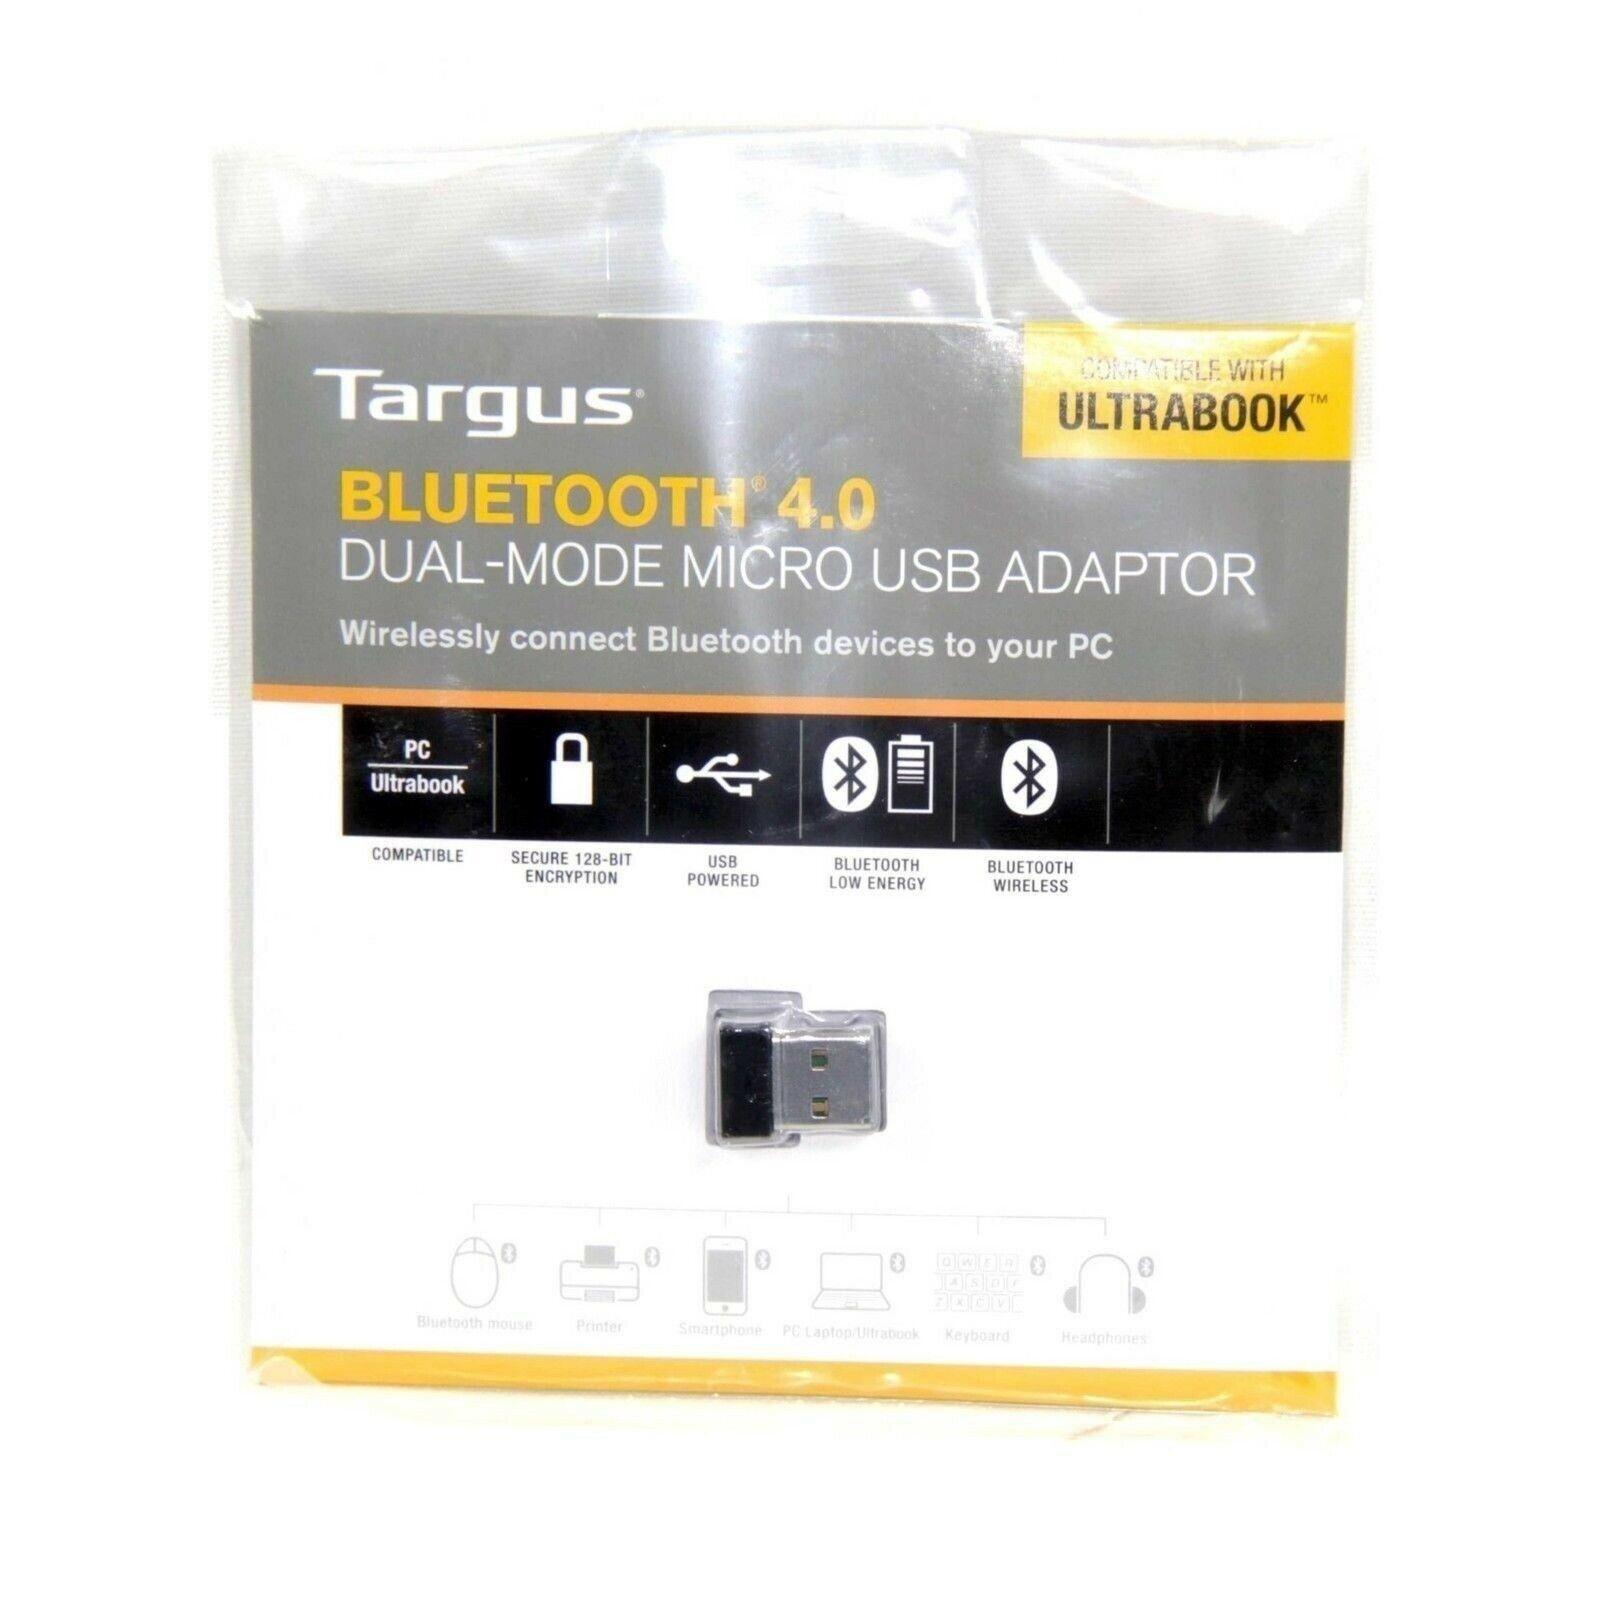 Targus ACB75AU Bluetooth 4.0 USB Adapter for sale online | eBay